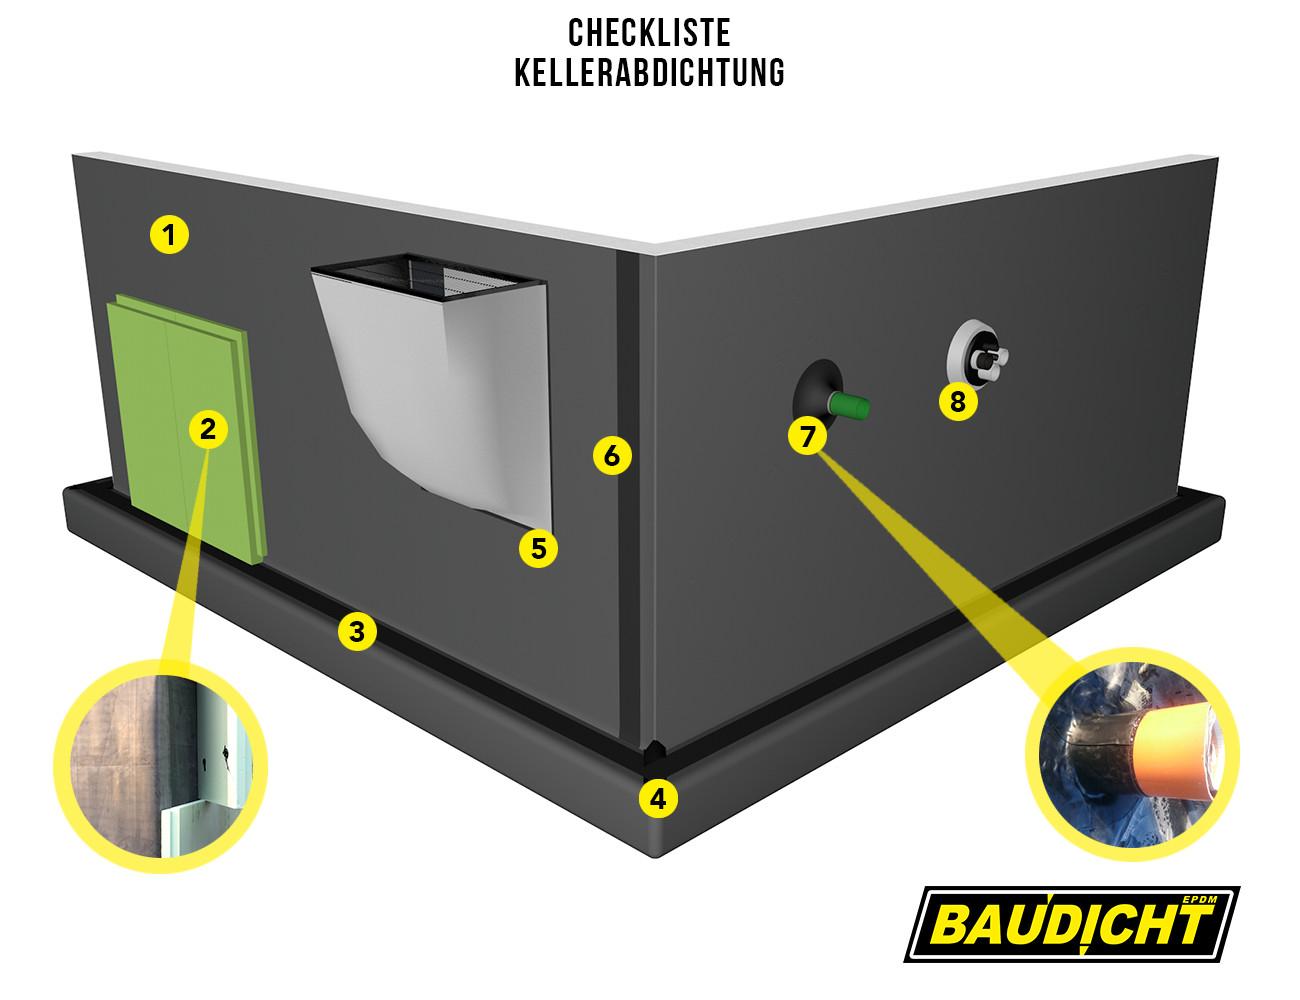 Checkliste Kellerabdichtung